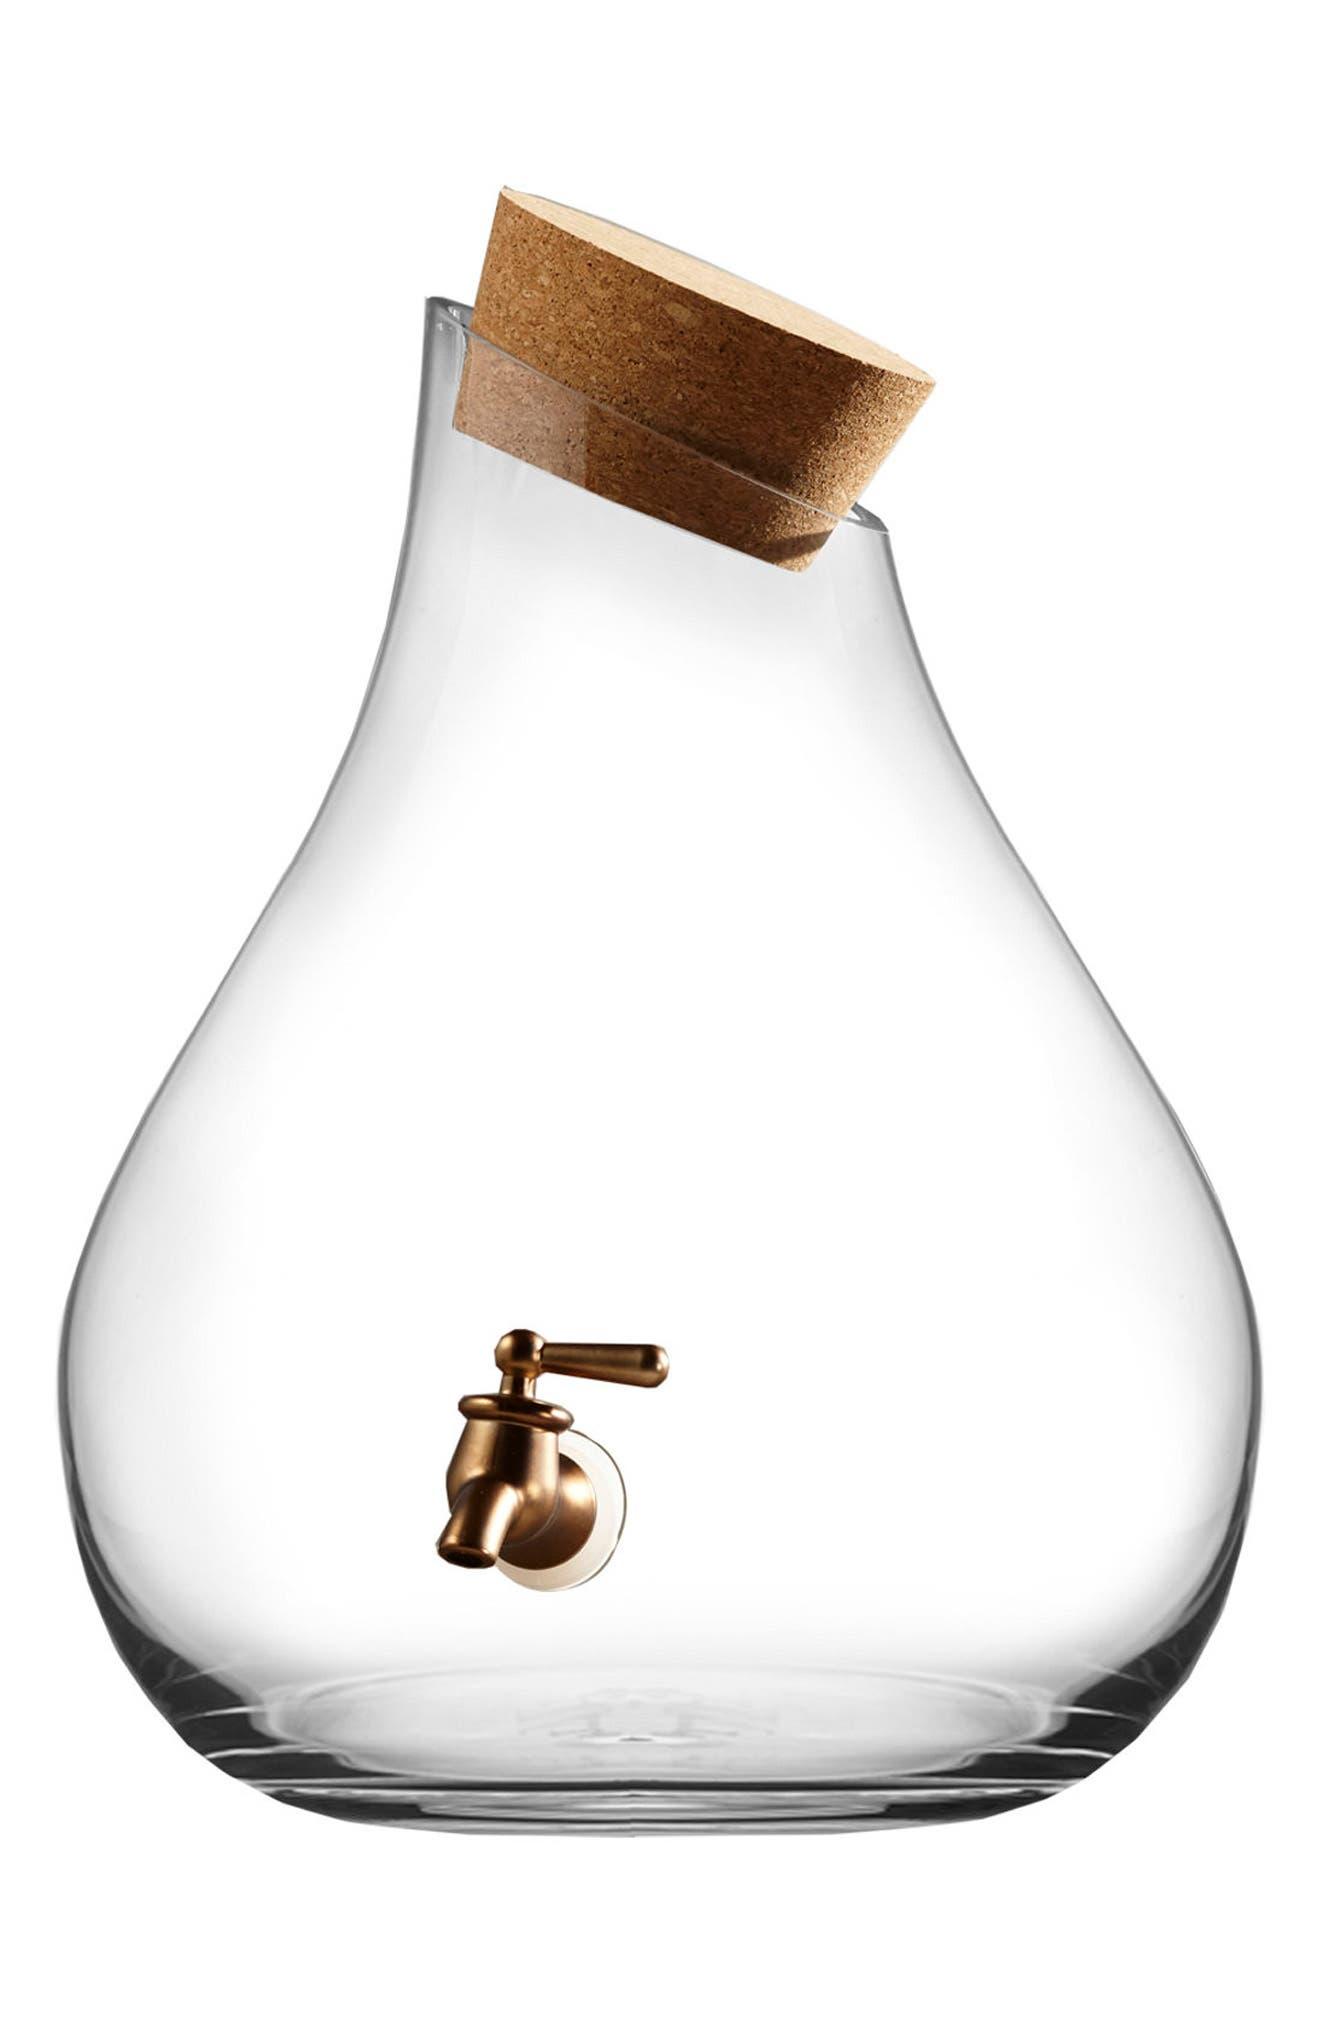 2.5-Gallon Beverage Dispenser,                             Main thumbnail 1, color,                             Clear